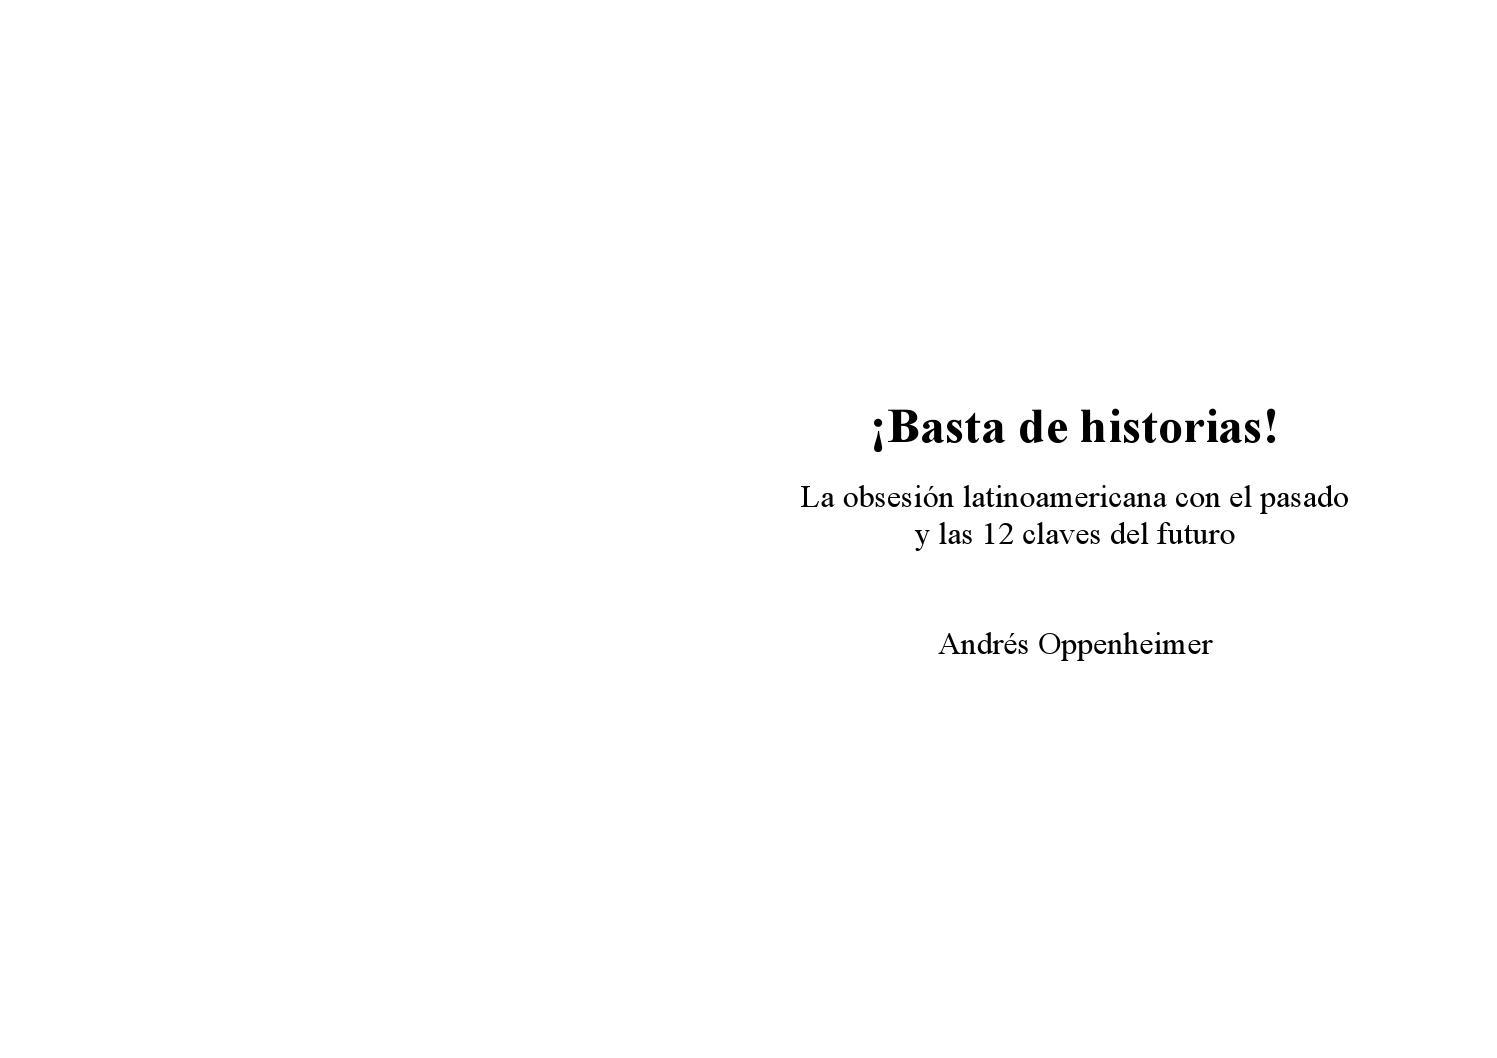 Basta de historias - Andres Oppenheimer by María Fernanda Morón ...